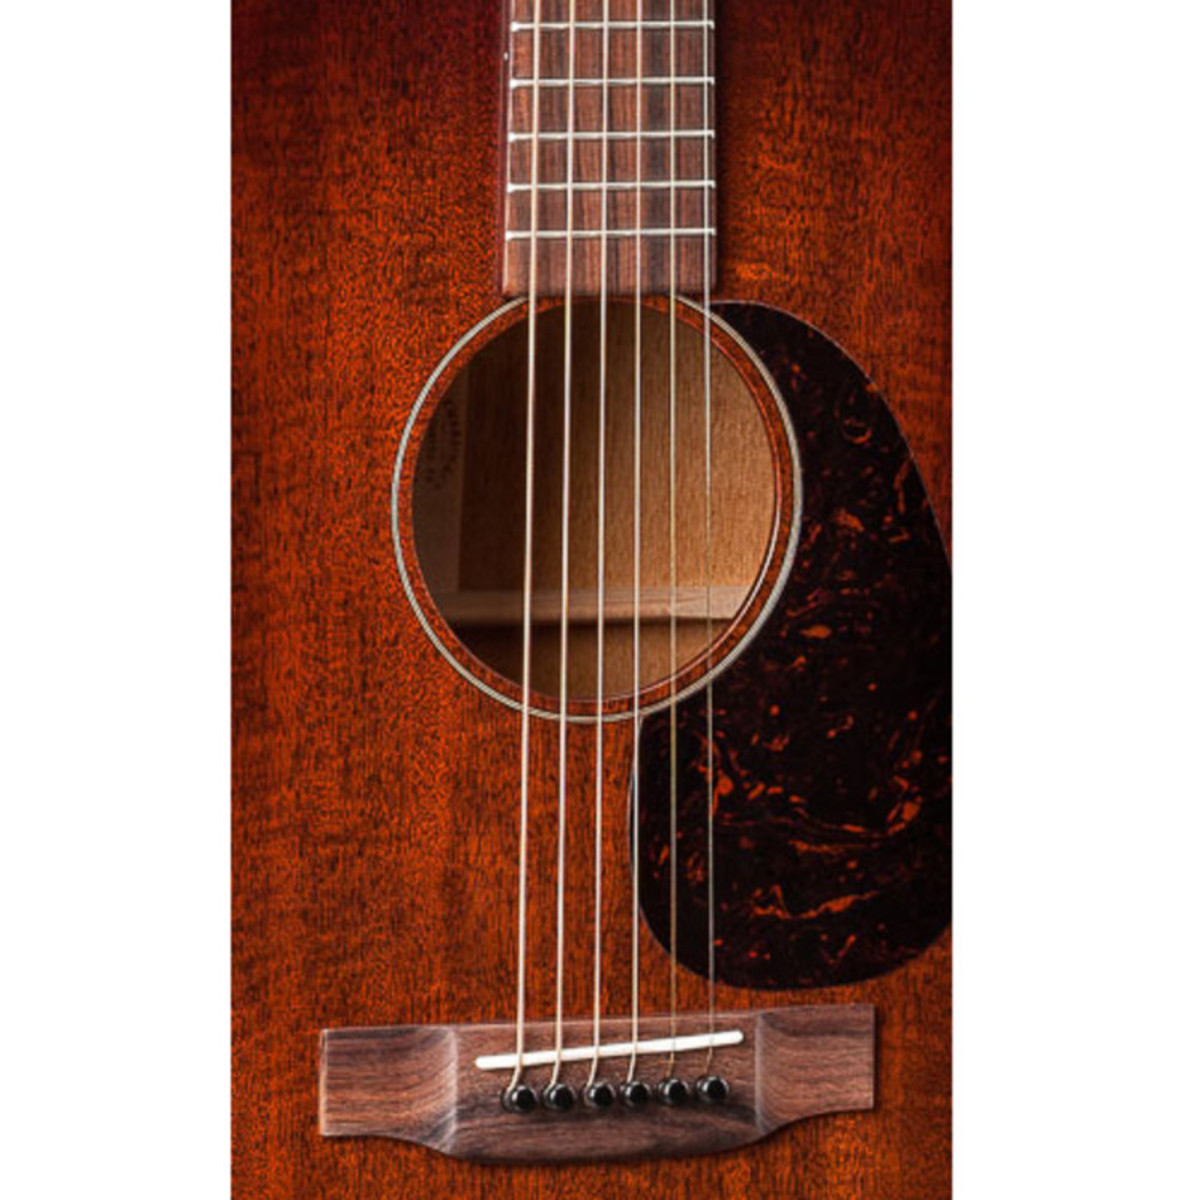 martin d 15m acoustic guitar mahogany burst top ex demo at gear4music. Black Bedroom Furniture Sets. Home Design Ideas